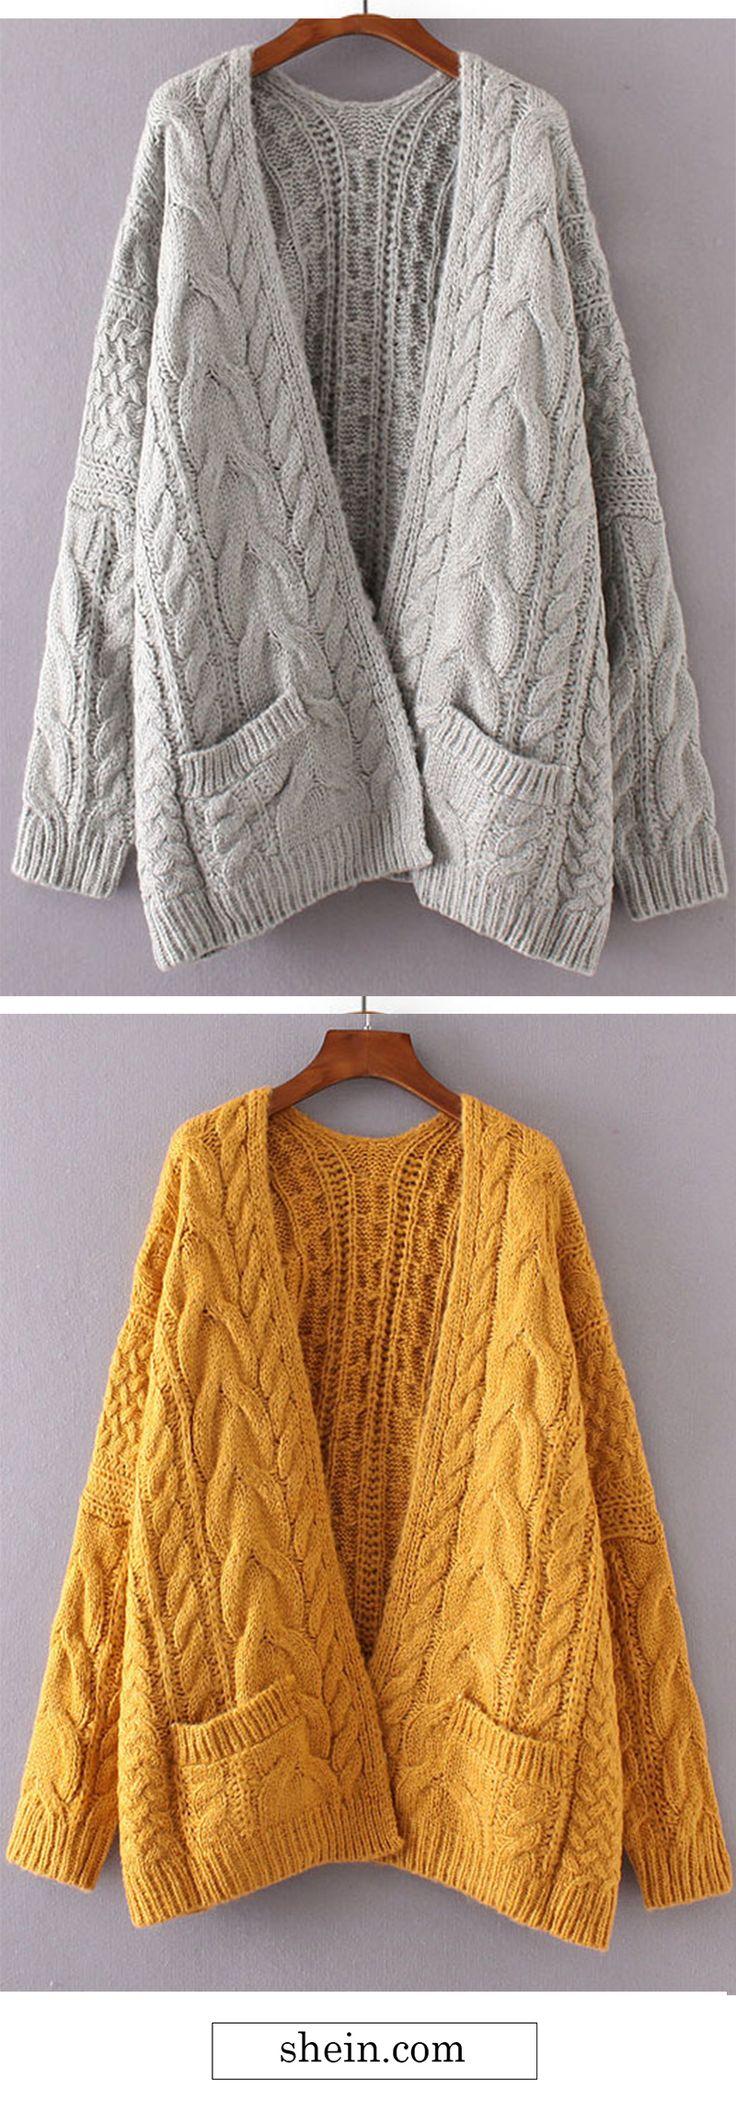 Drop shoulder cable knit cardigan.